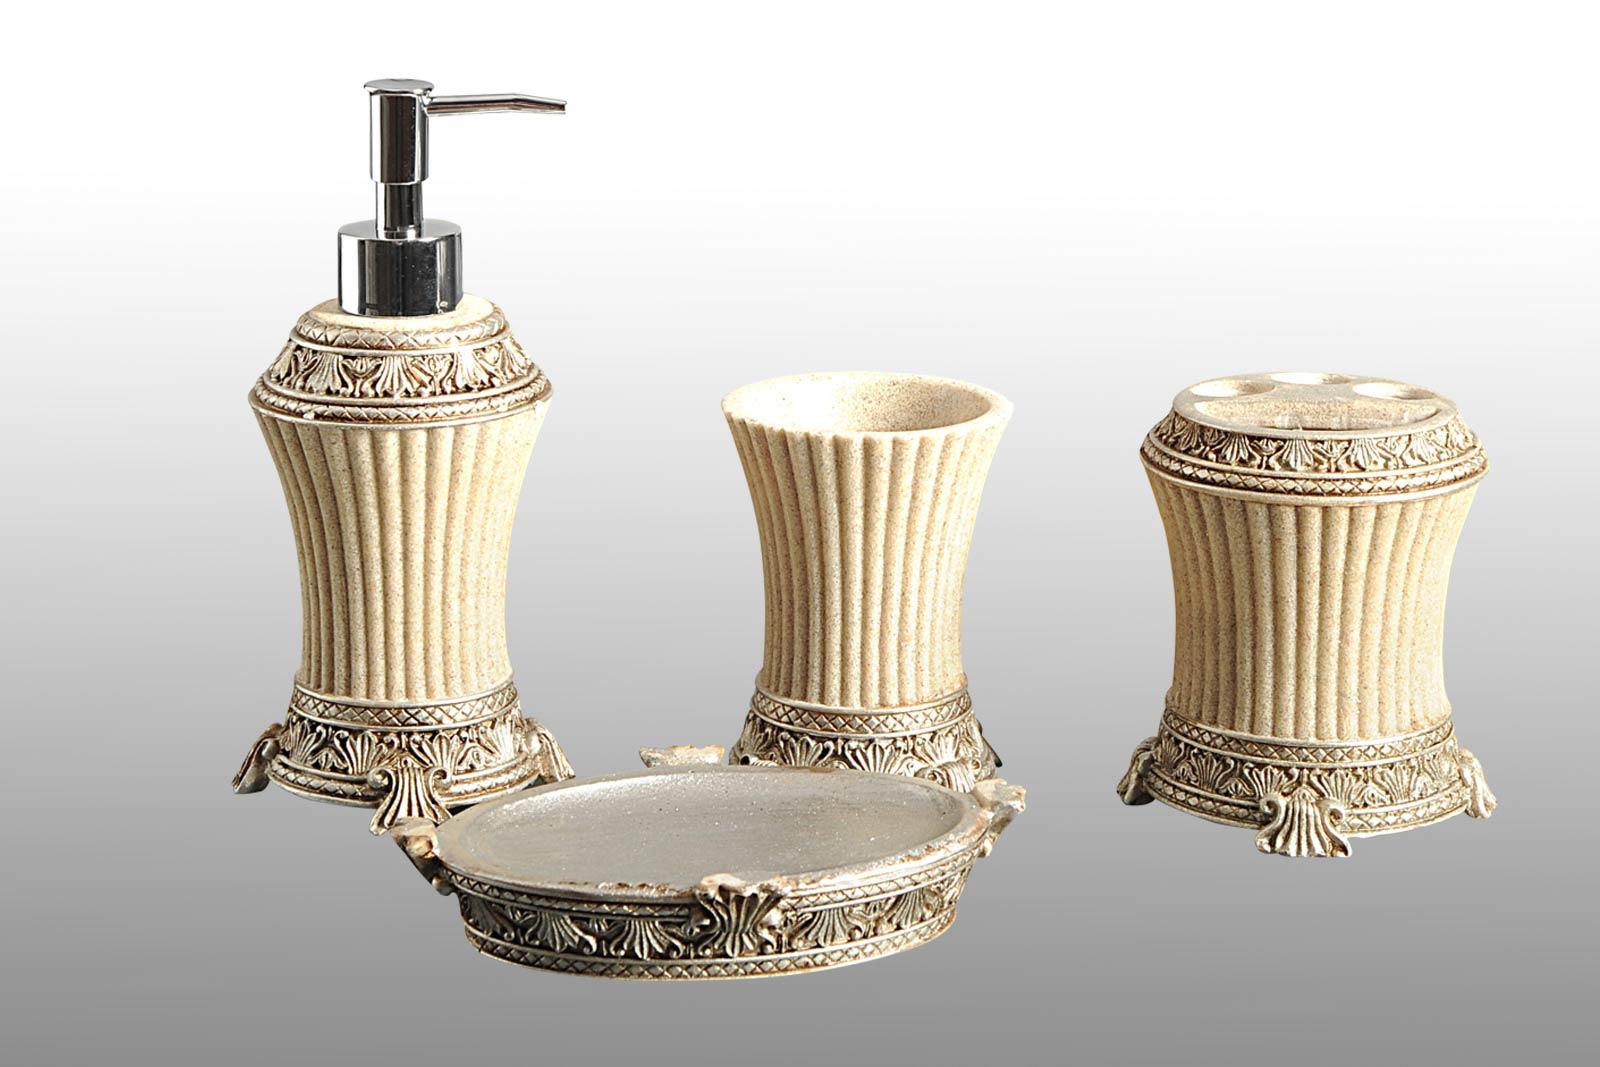 Antique Bath Accessories